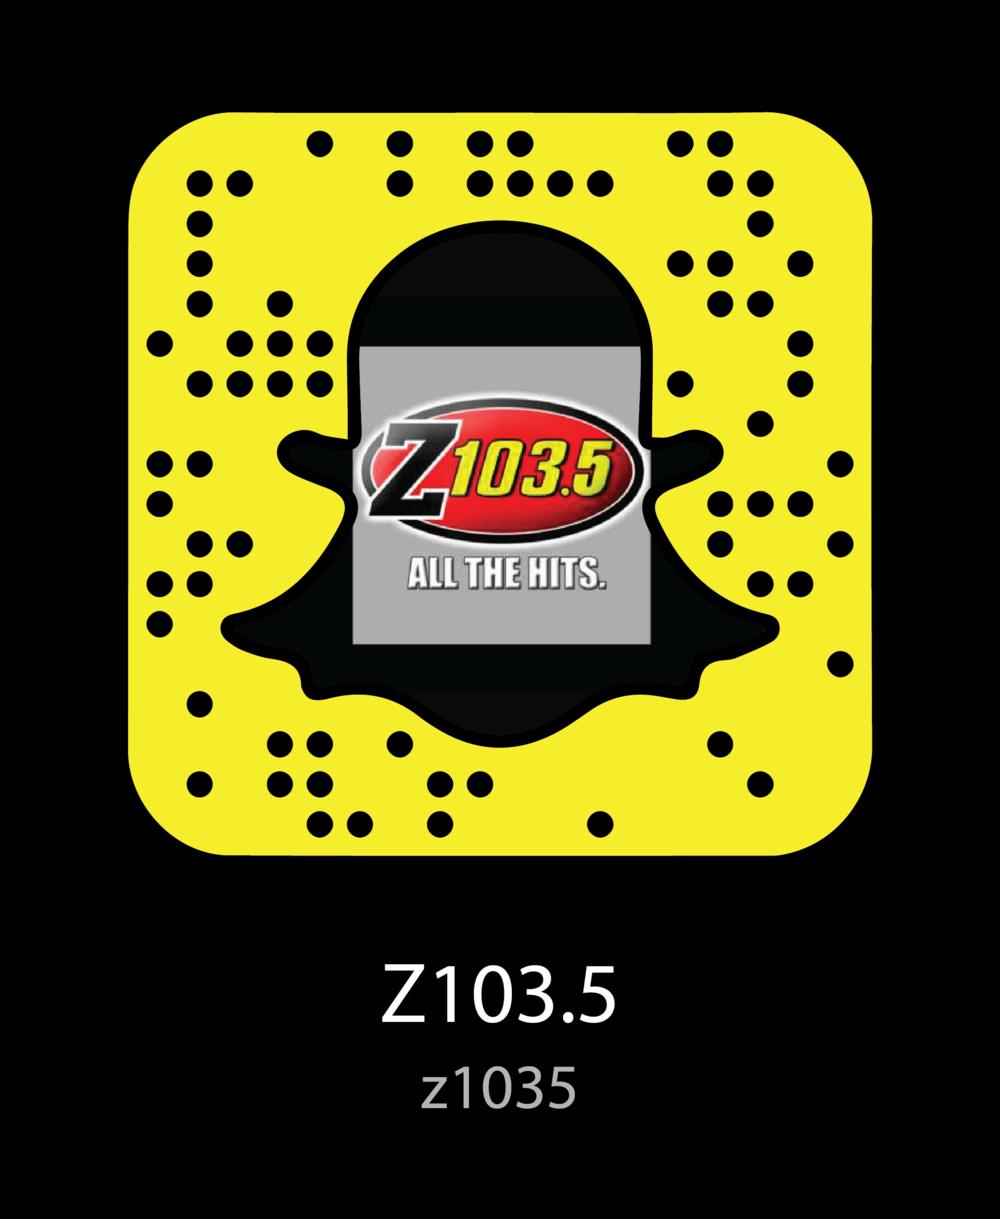 z1035-Radio-Stations-snapchat-snapcode.png